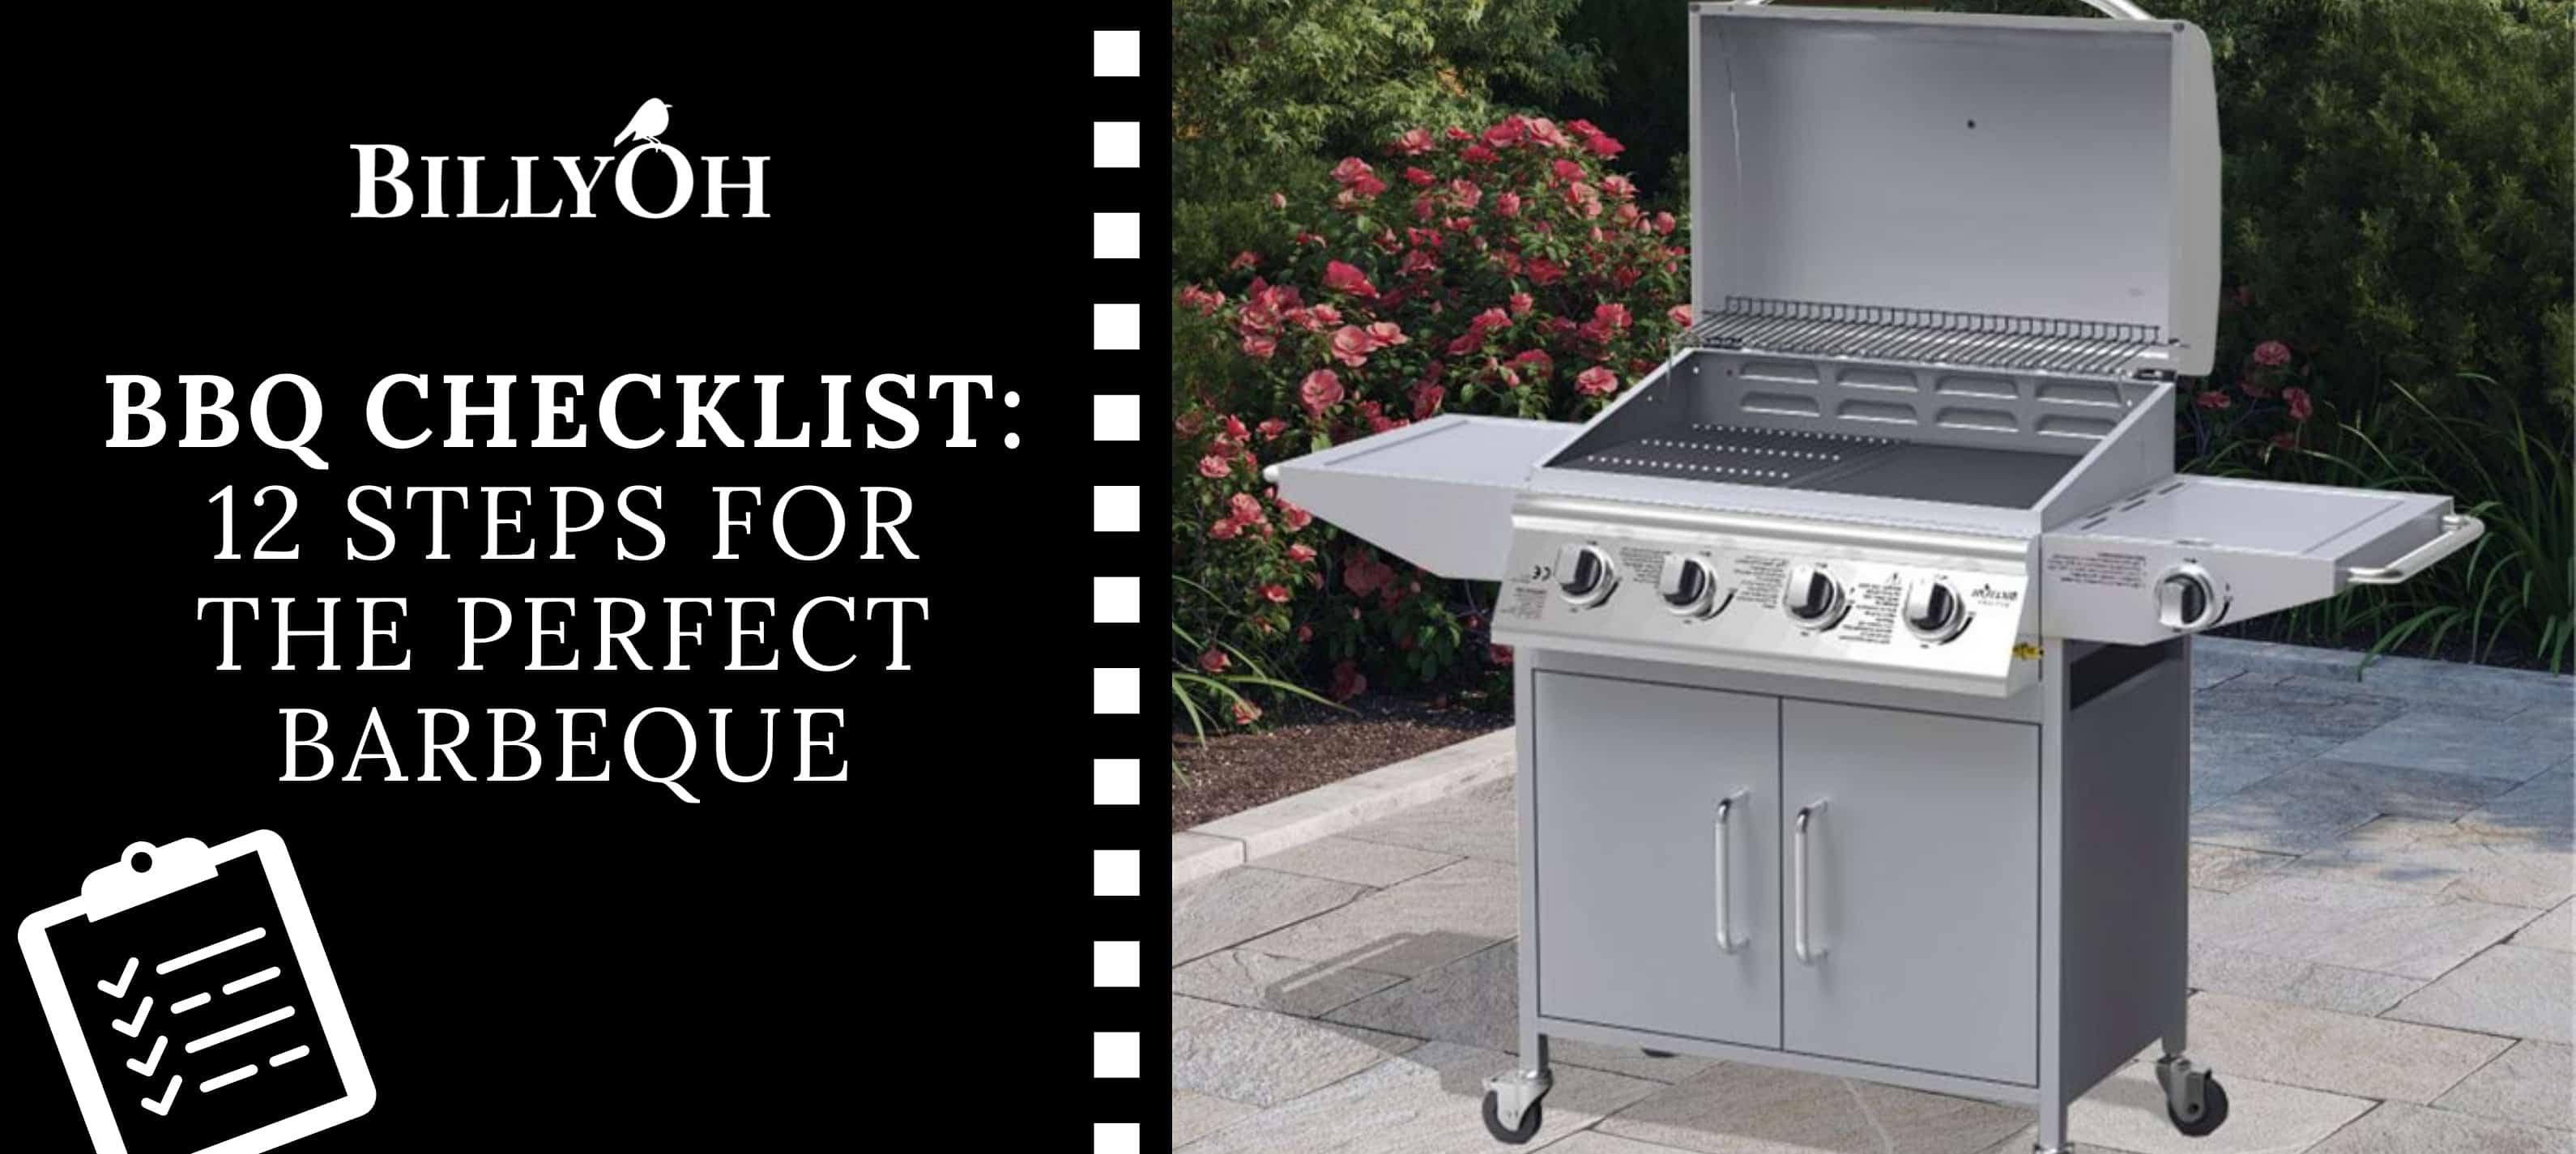 Perfect BBQ Checklist with BillyOh Huntsville Silver 4 Burner Gas BBQ on patio